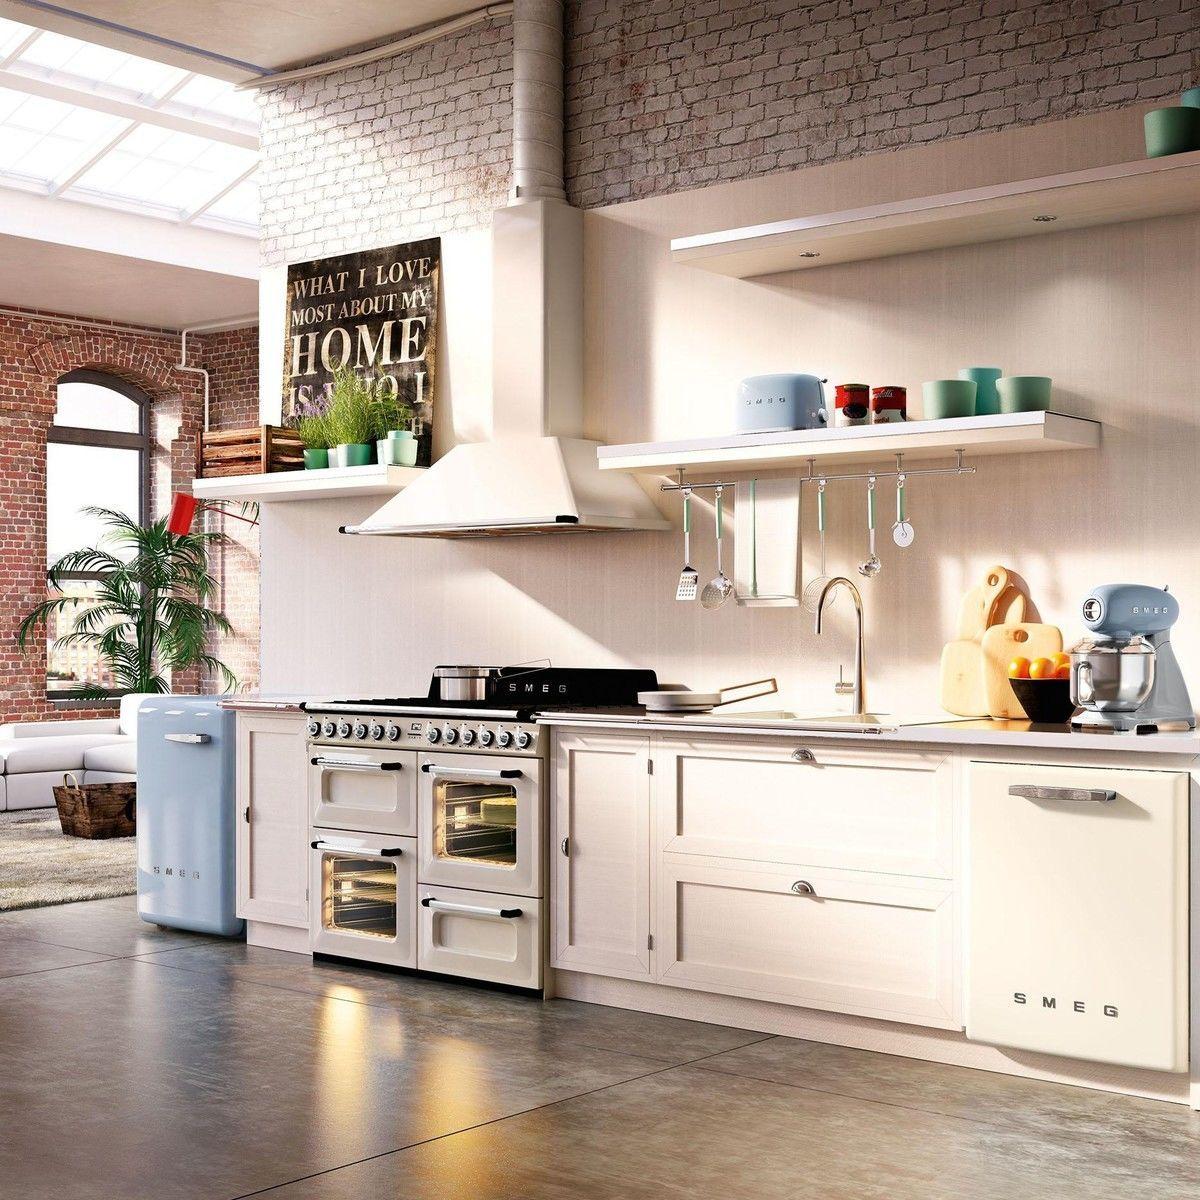 lbb14 waschmaschine smeg. Black Bedroom Furniture Sets. Home Design Ideas